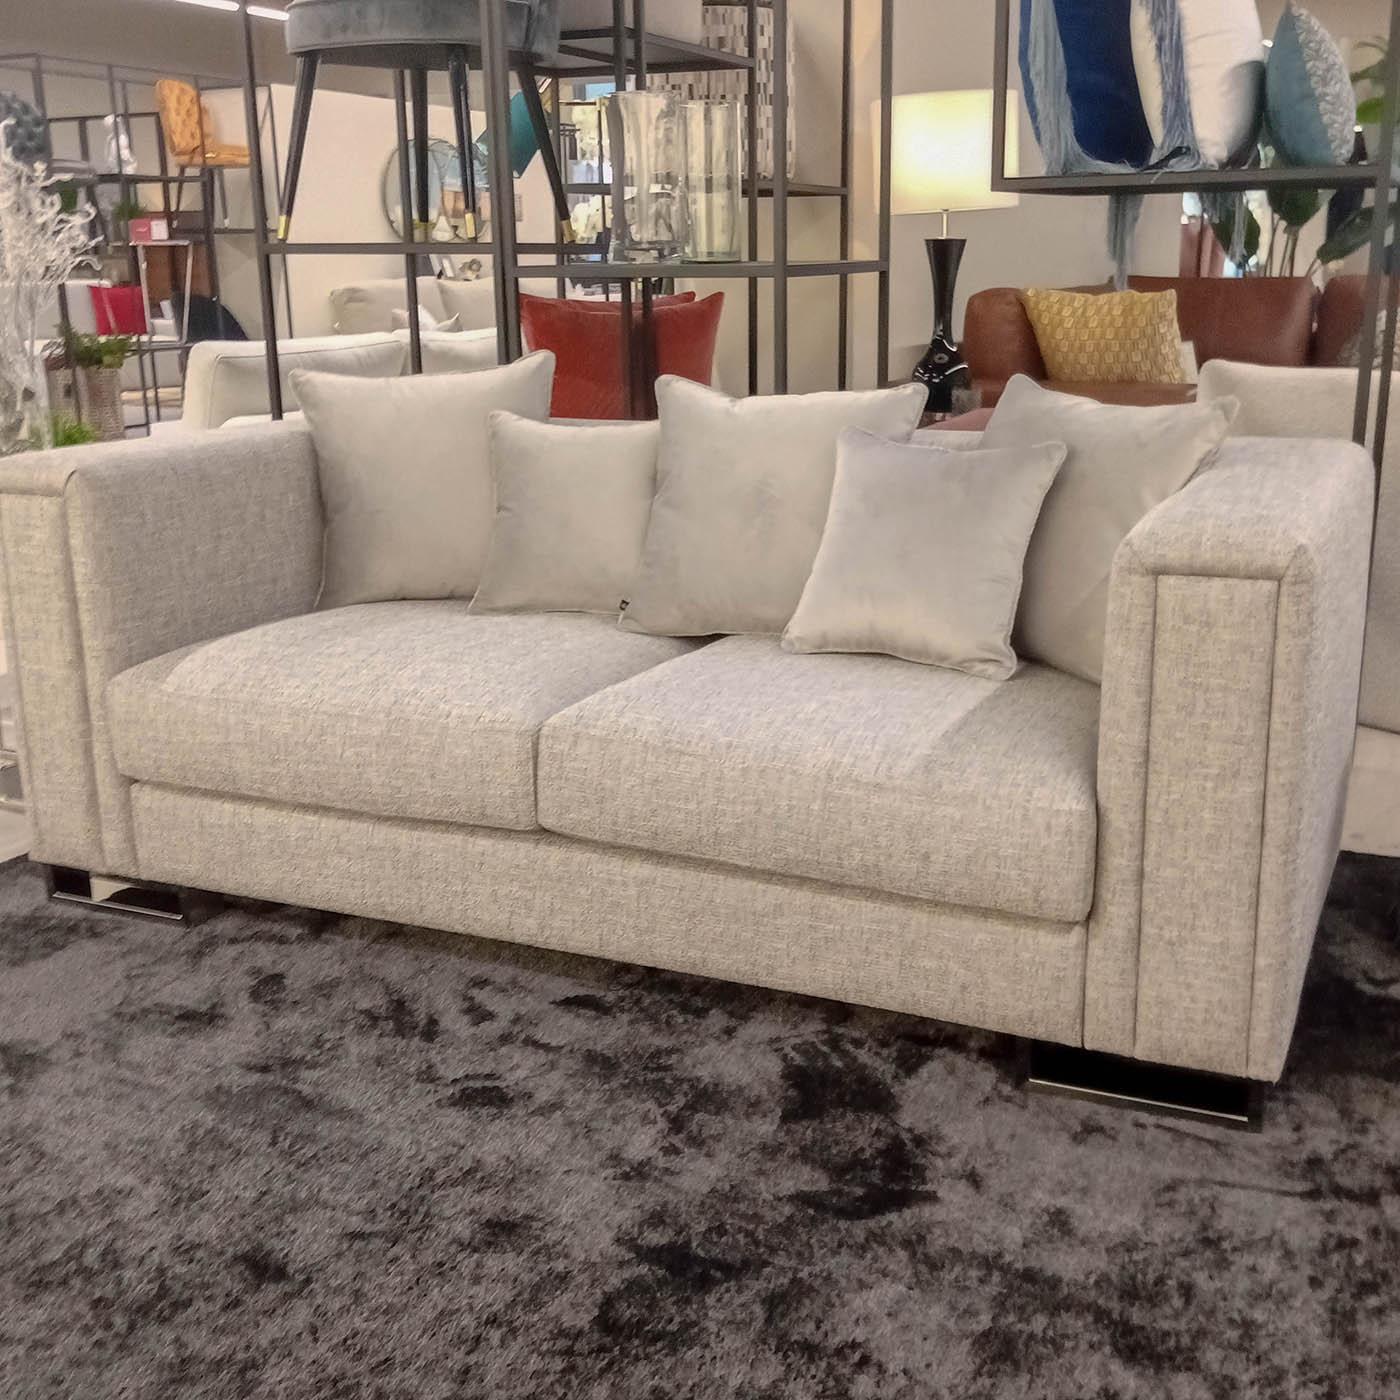 sofa-modelo-unico-domkapa-black-friday